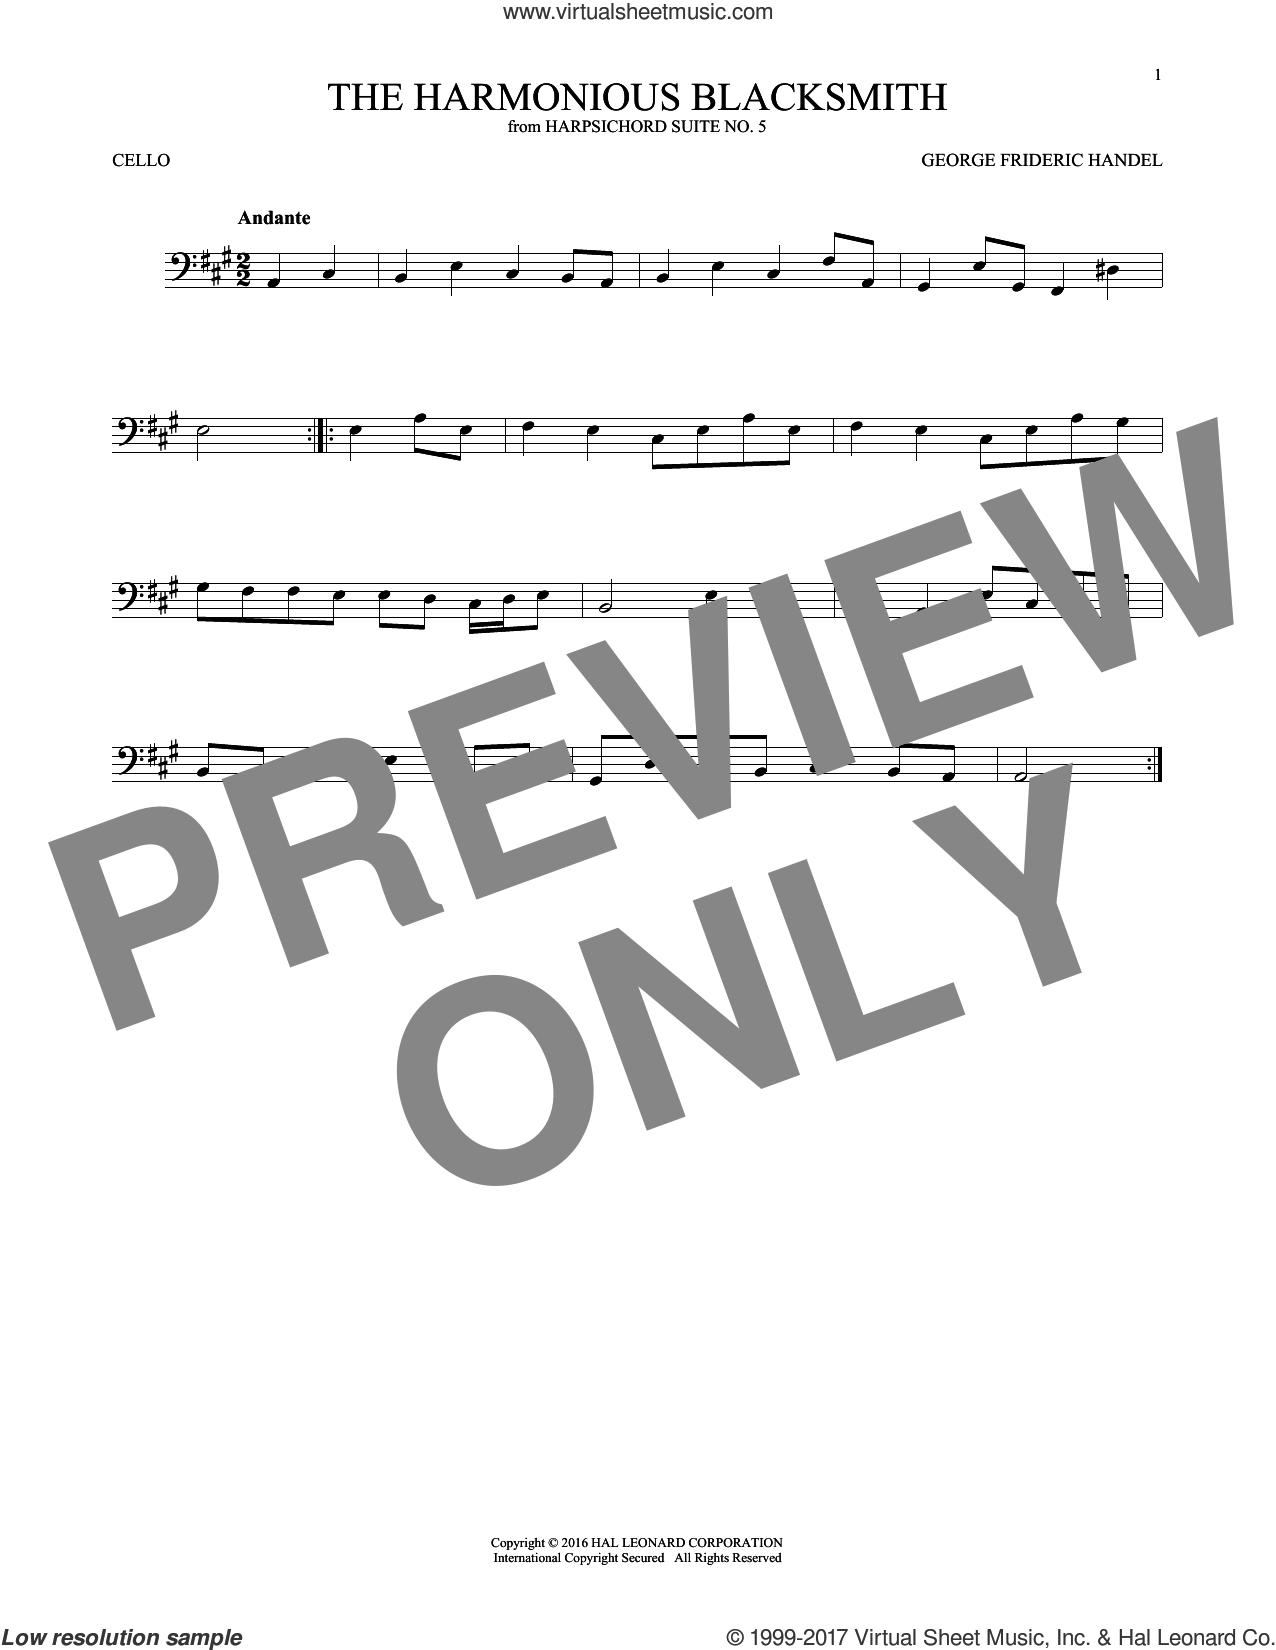 Harmonious Blacksmith sheet music for cello solo by George Frideric Handel, classical score, intermediate skill level